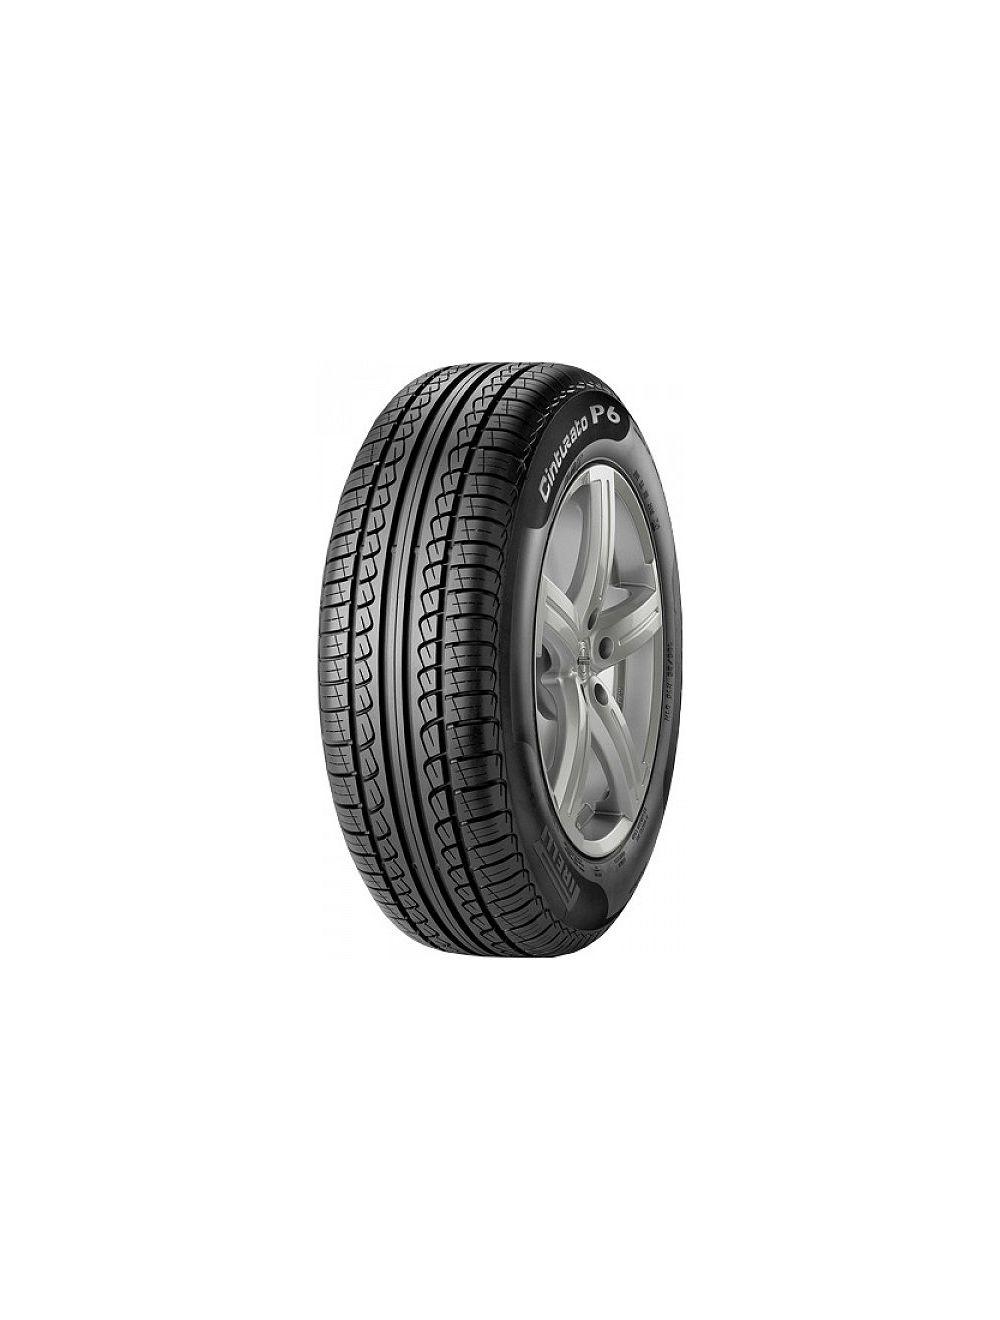 Pirelli 185/60R15 H P6 Cinturato K1 DOT17 Nyári gumi